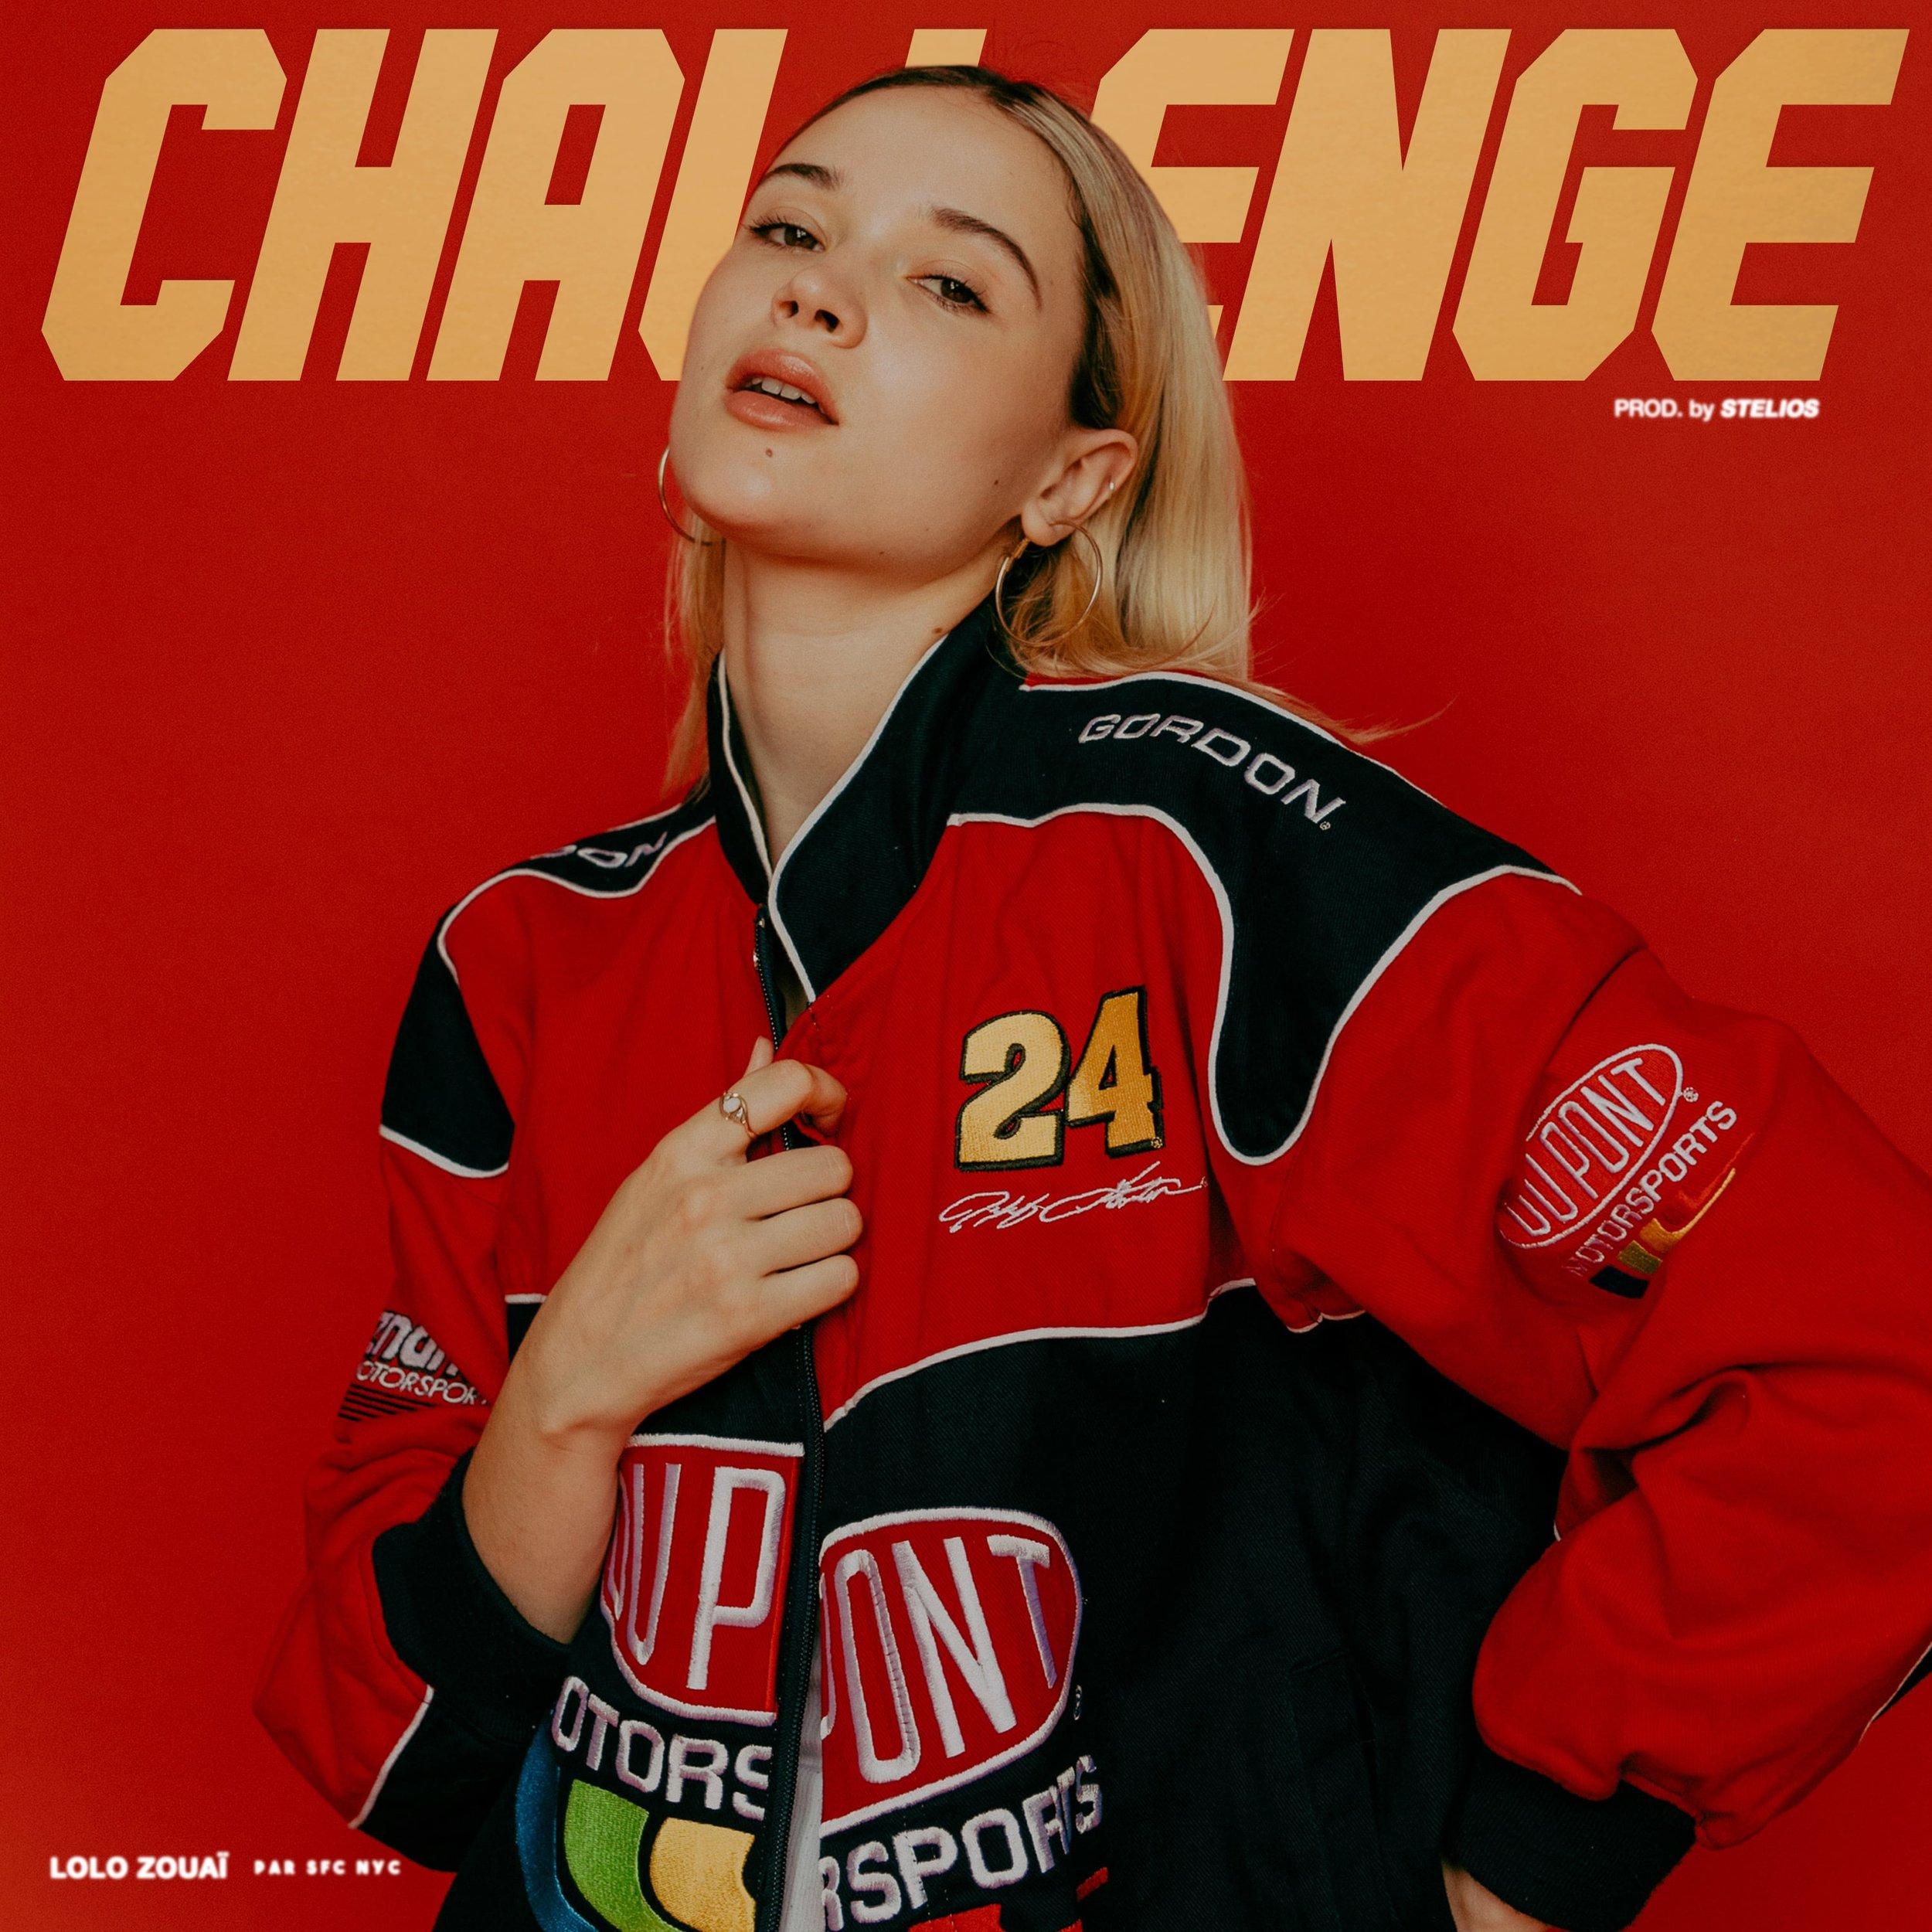 challenge-web.jpg